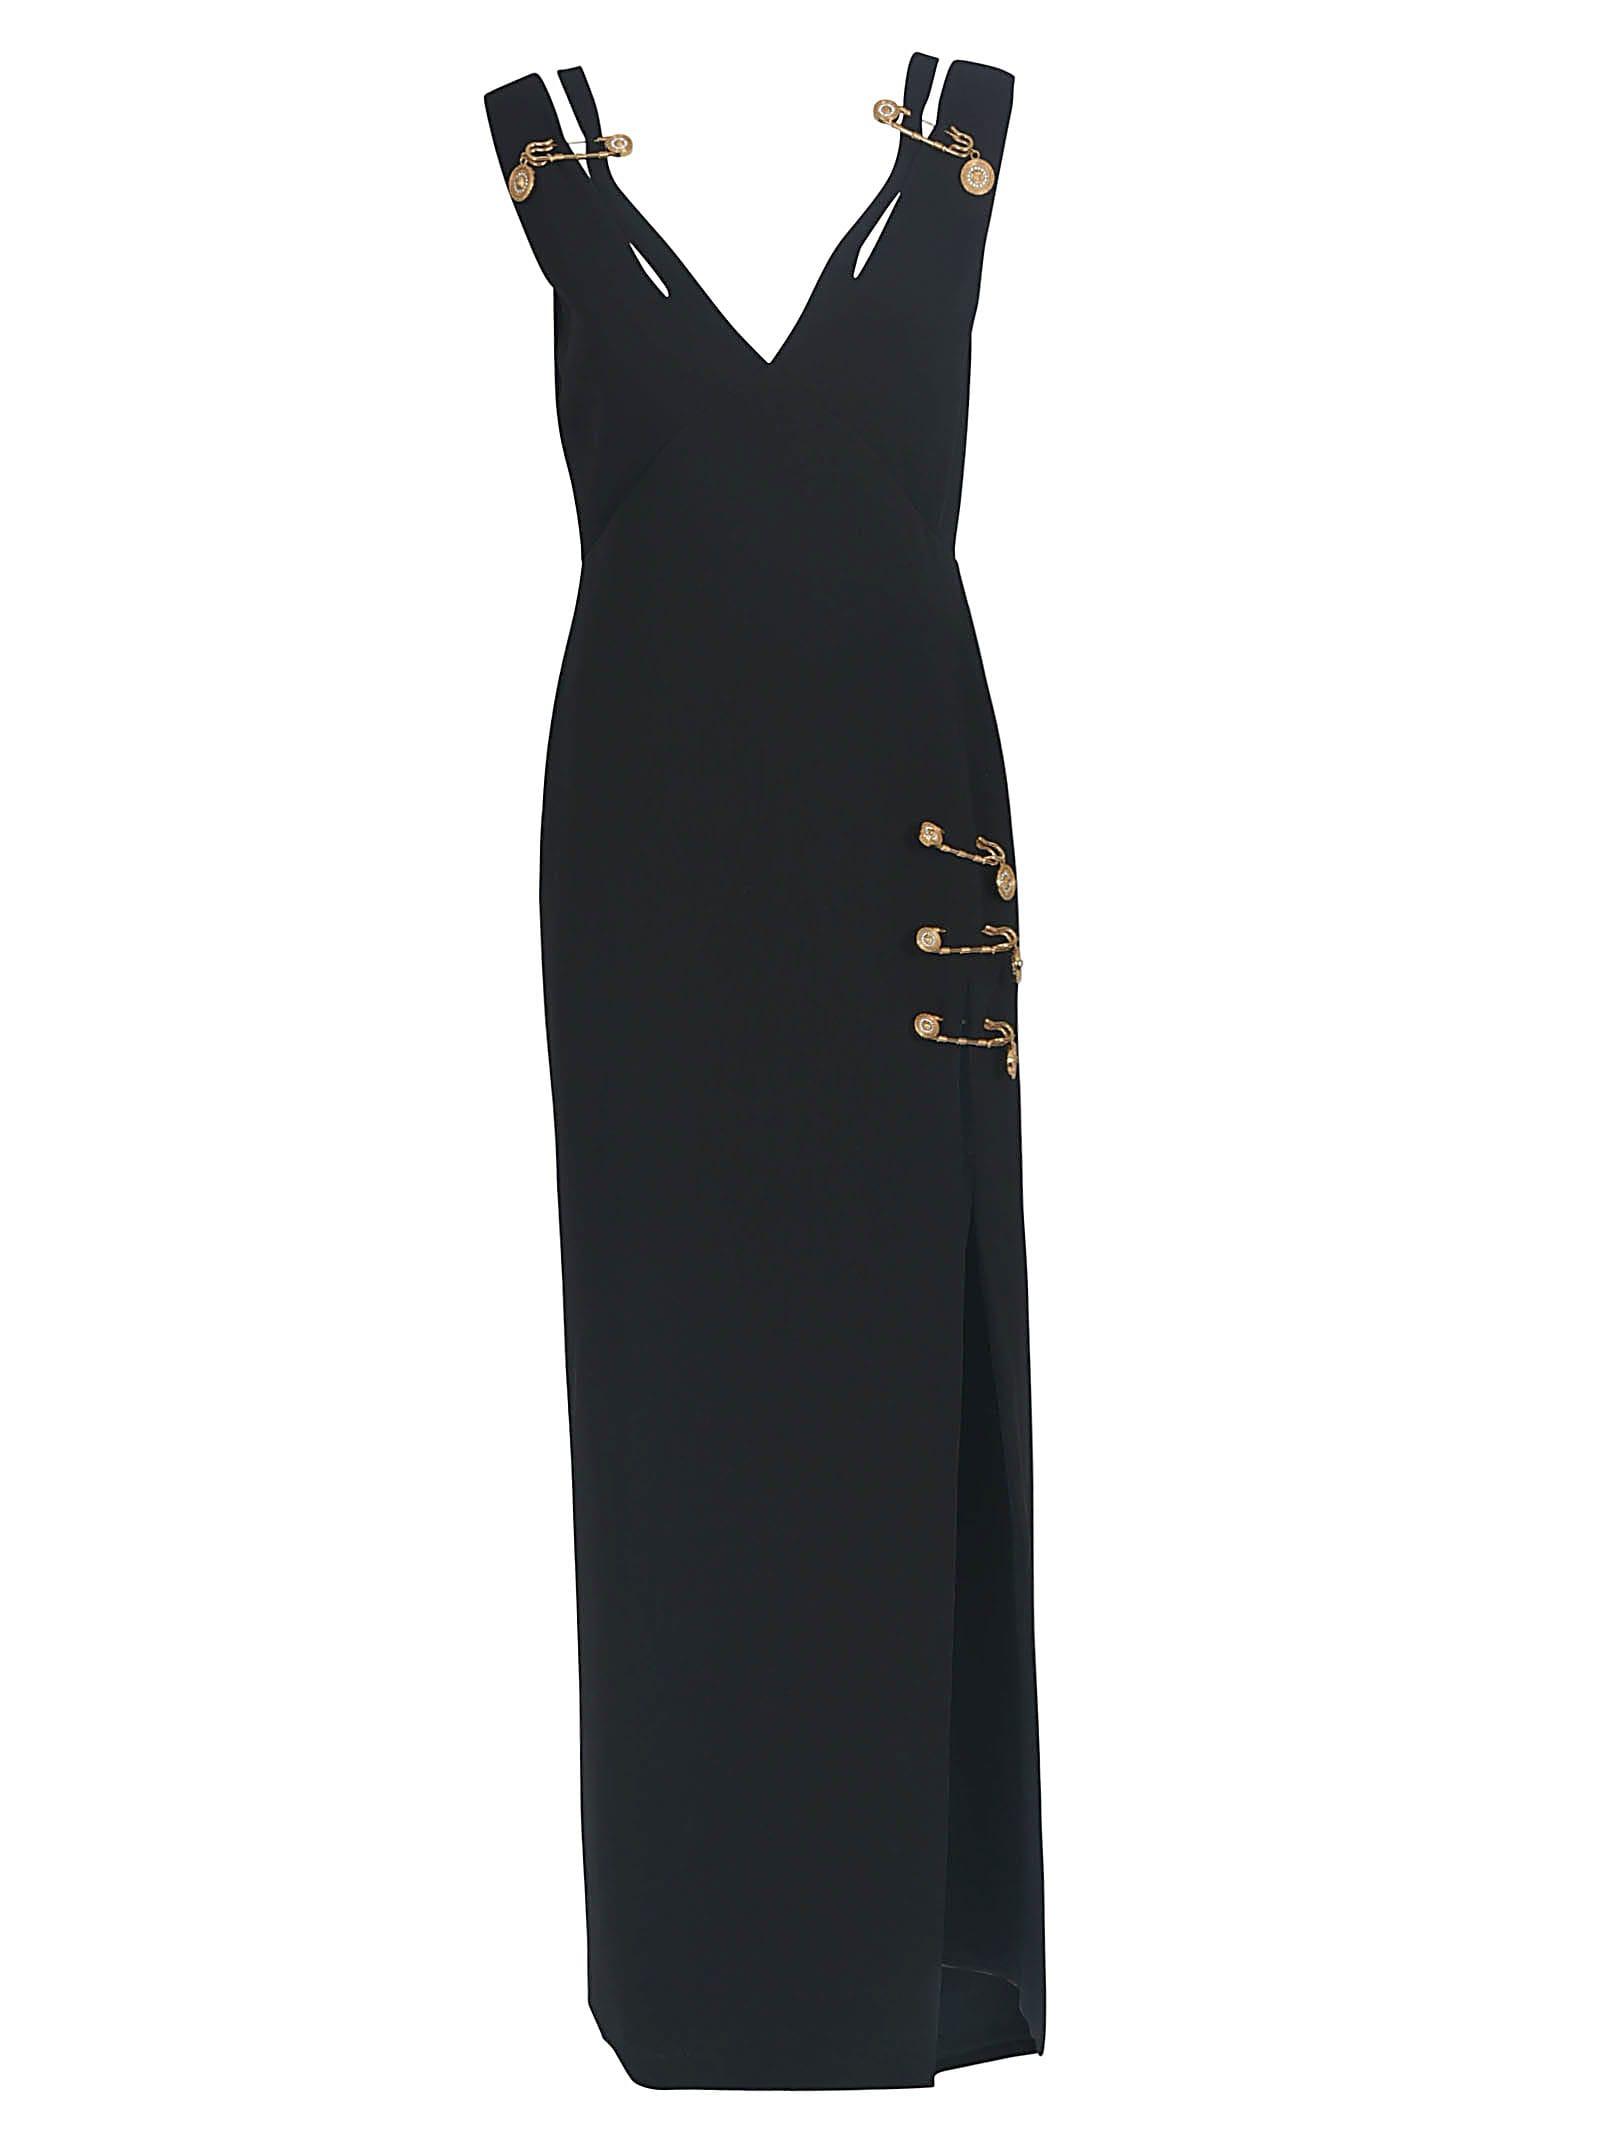 Versace Silks SAFETY PIN EMBELLISHED V-NECK LONG DRESS